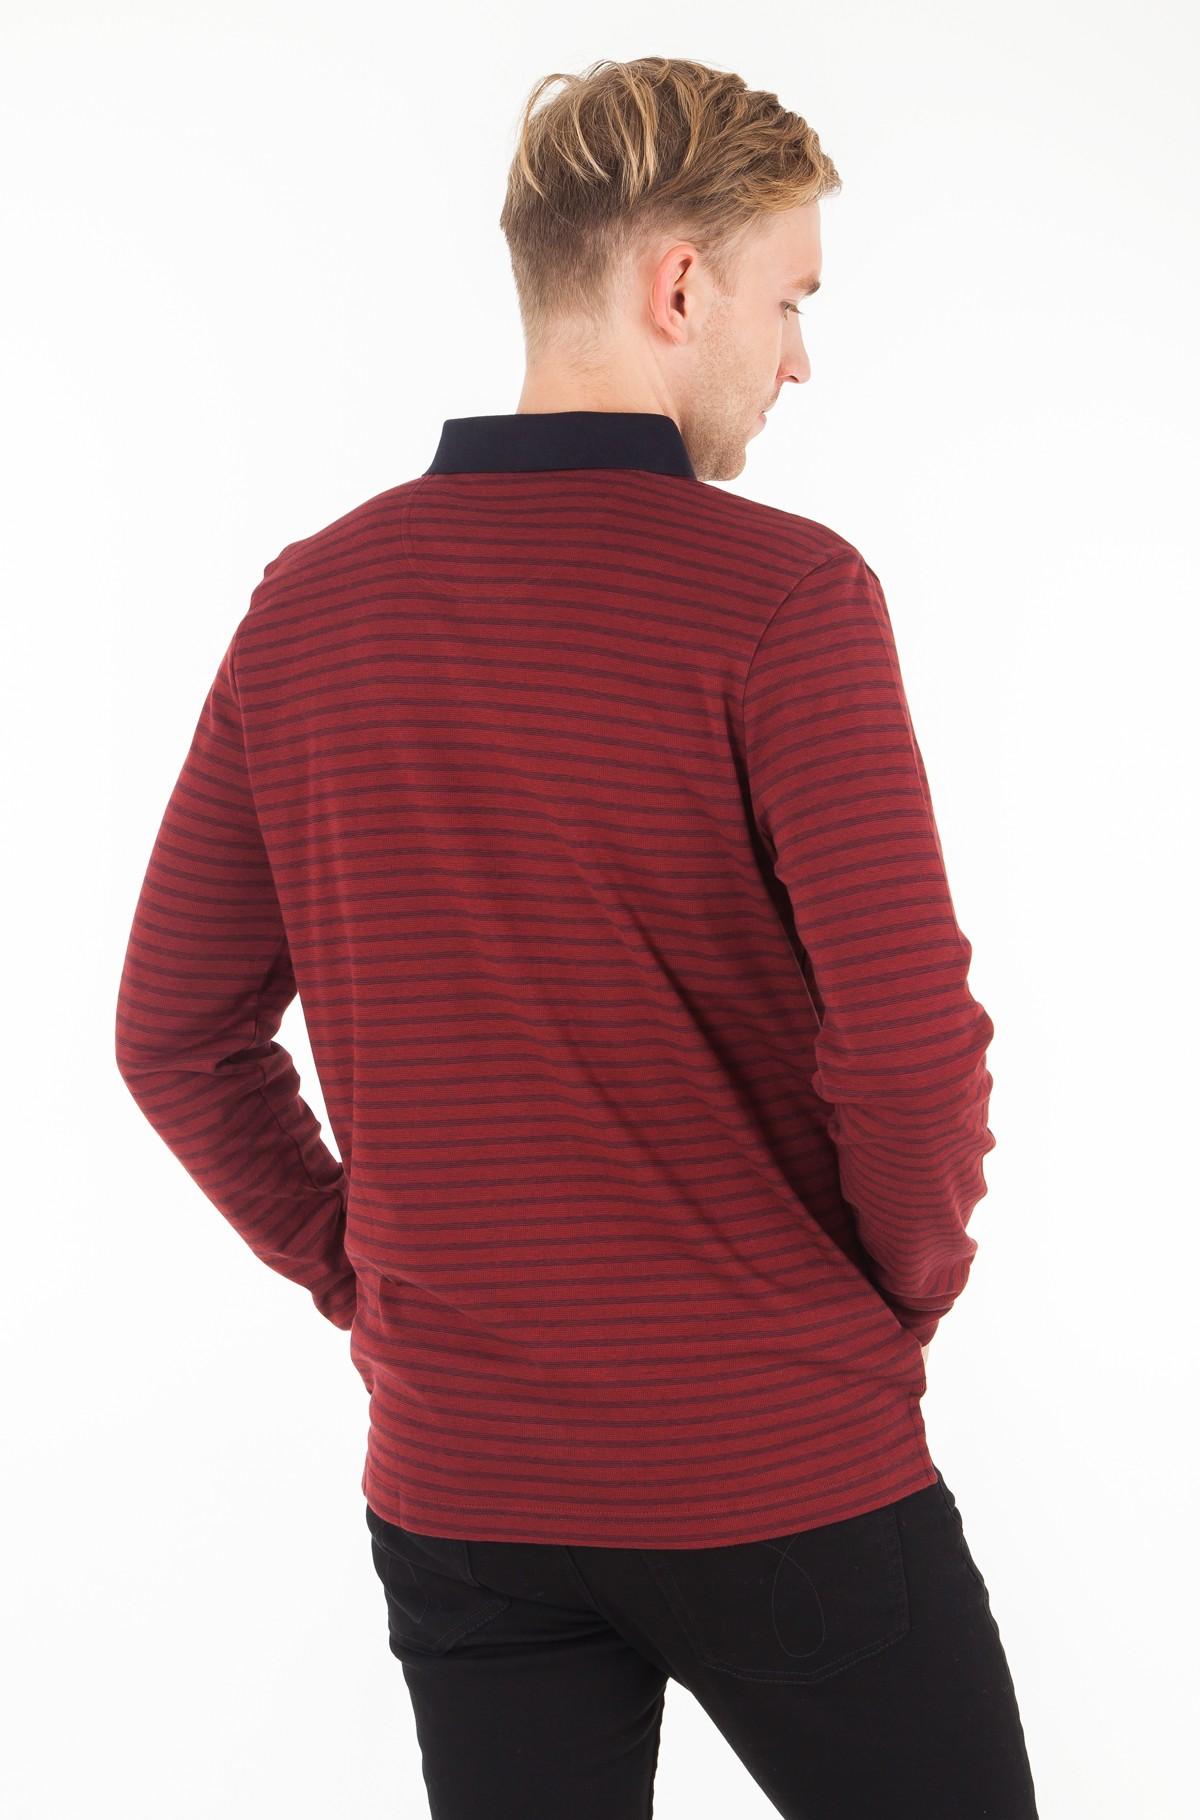 Polo marškinėliai ilgomis rankovėmis 53834-82311-full-2